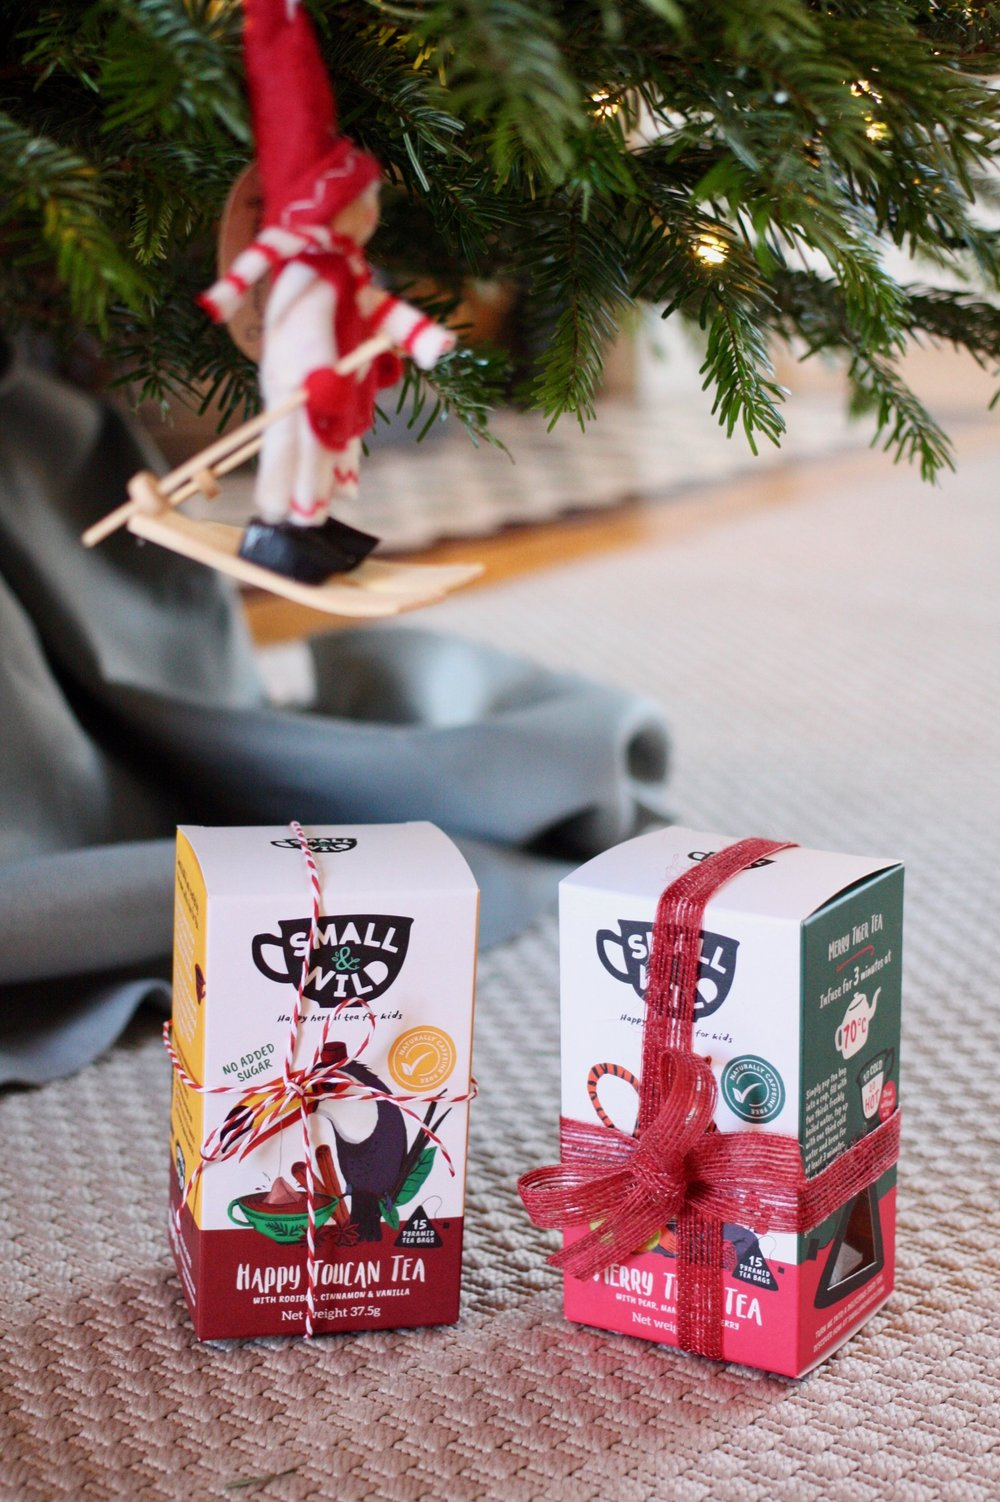 small & wild tea under Christmas tree